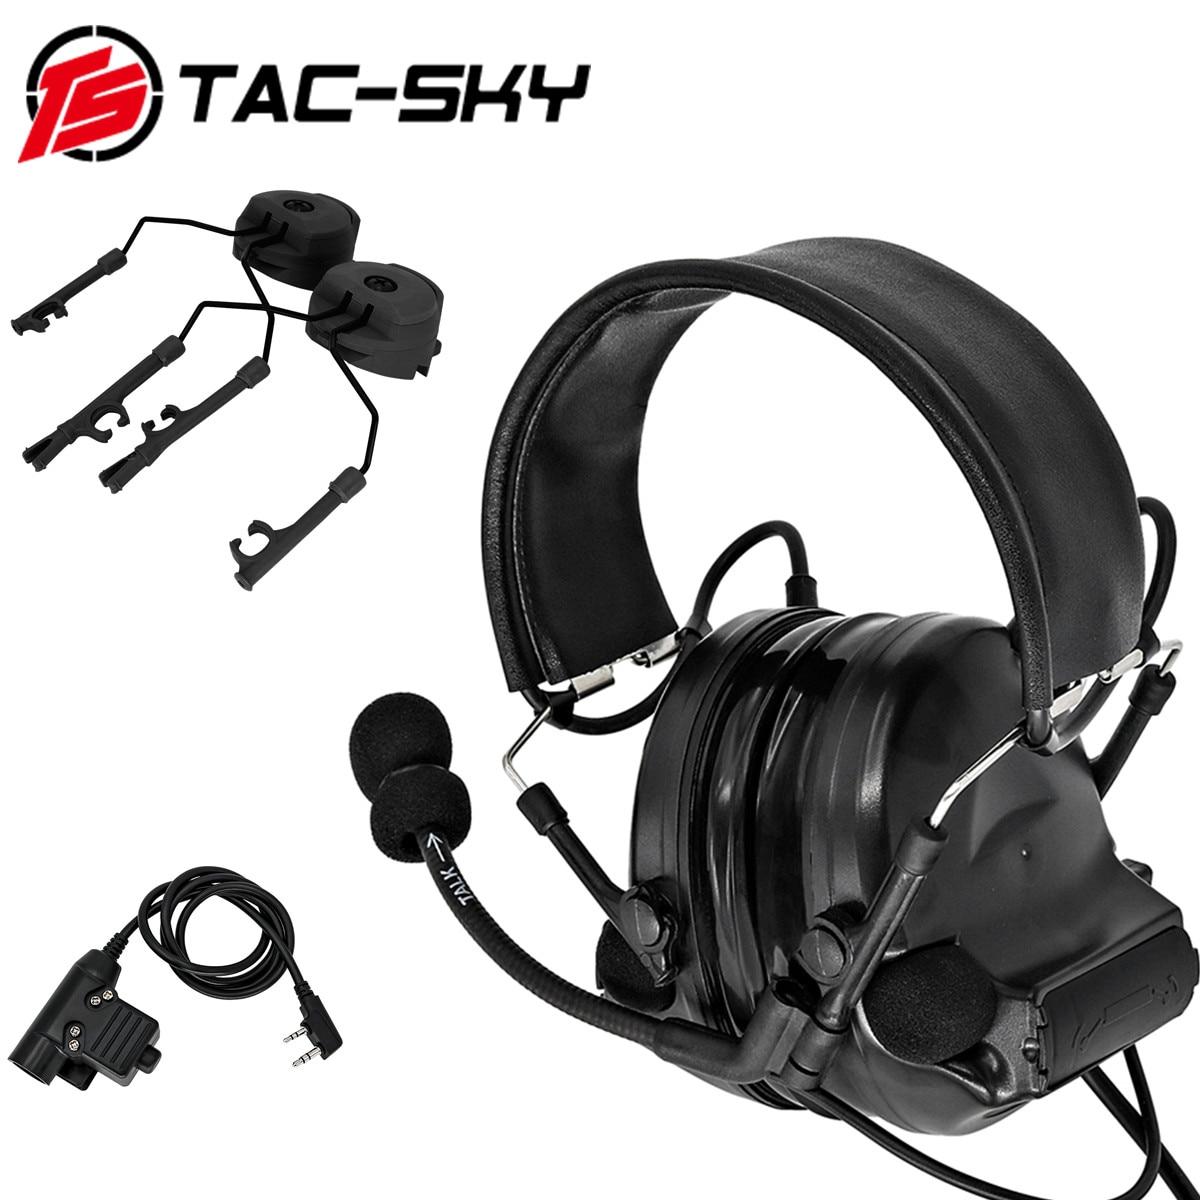 TAC-SKY Tactical Hunting COMTAC II Noise-cancelling Pickup Headphones + Tactical PTT U94 PTT +ARC OPS-CORE Helmet Track Adapter